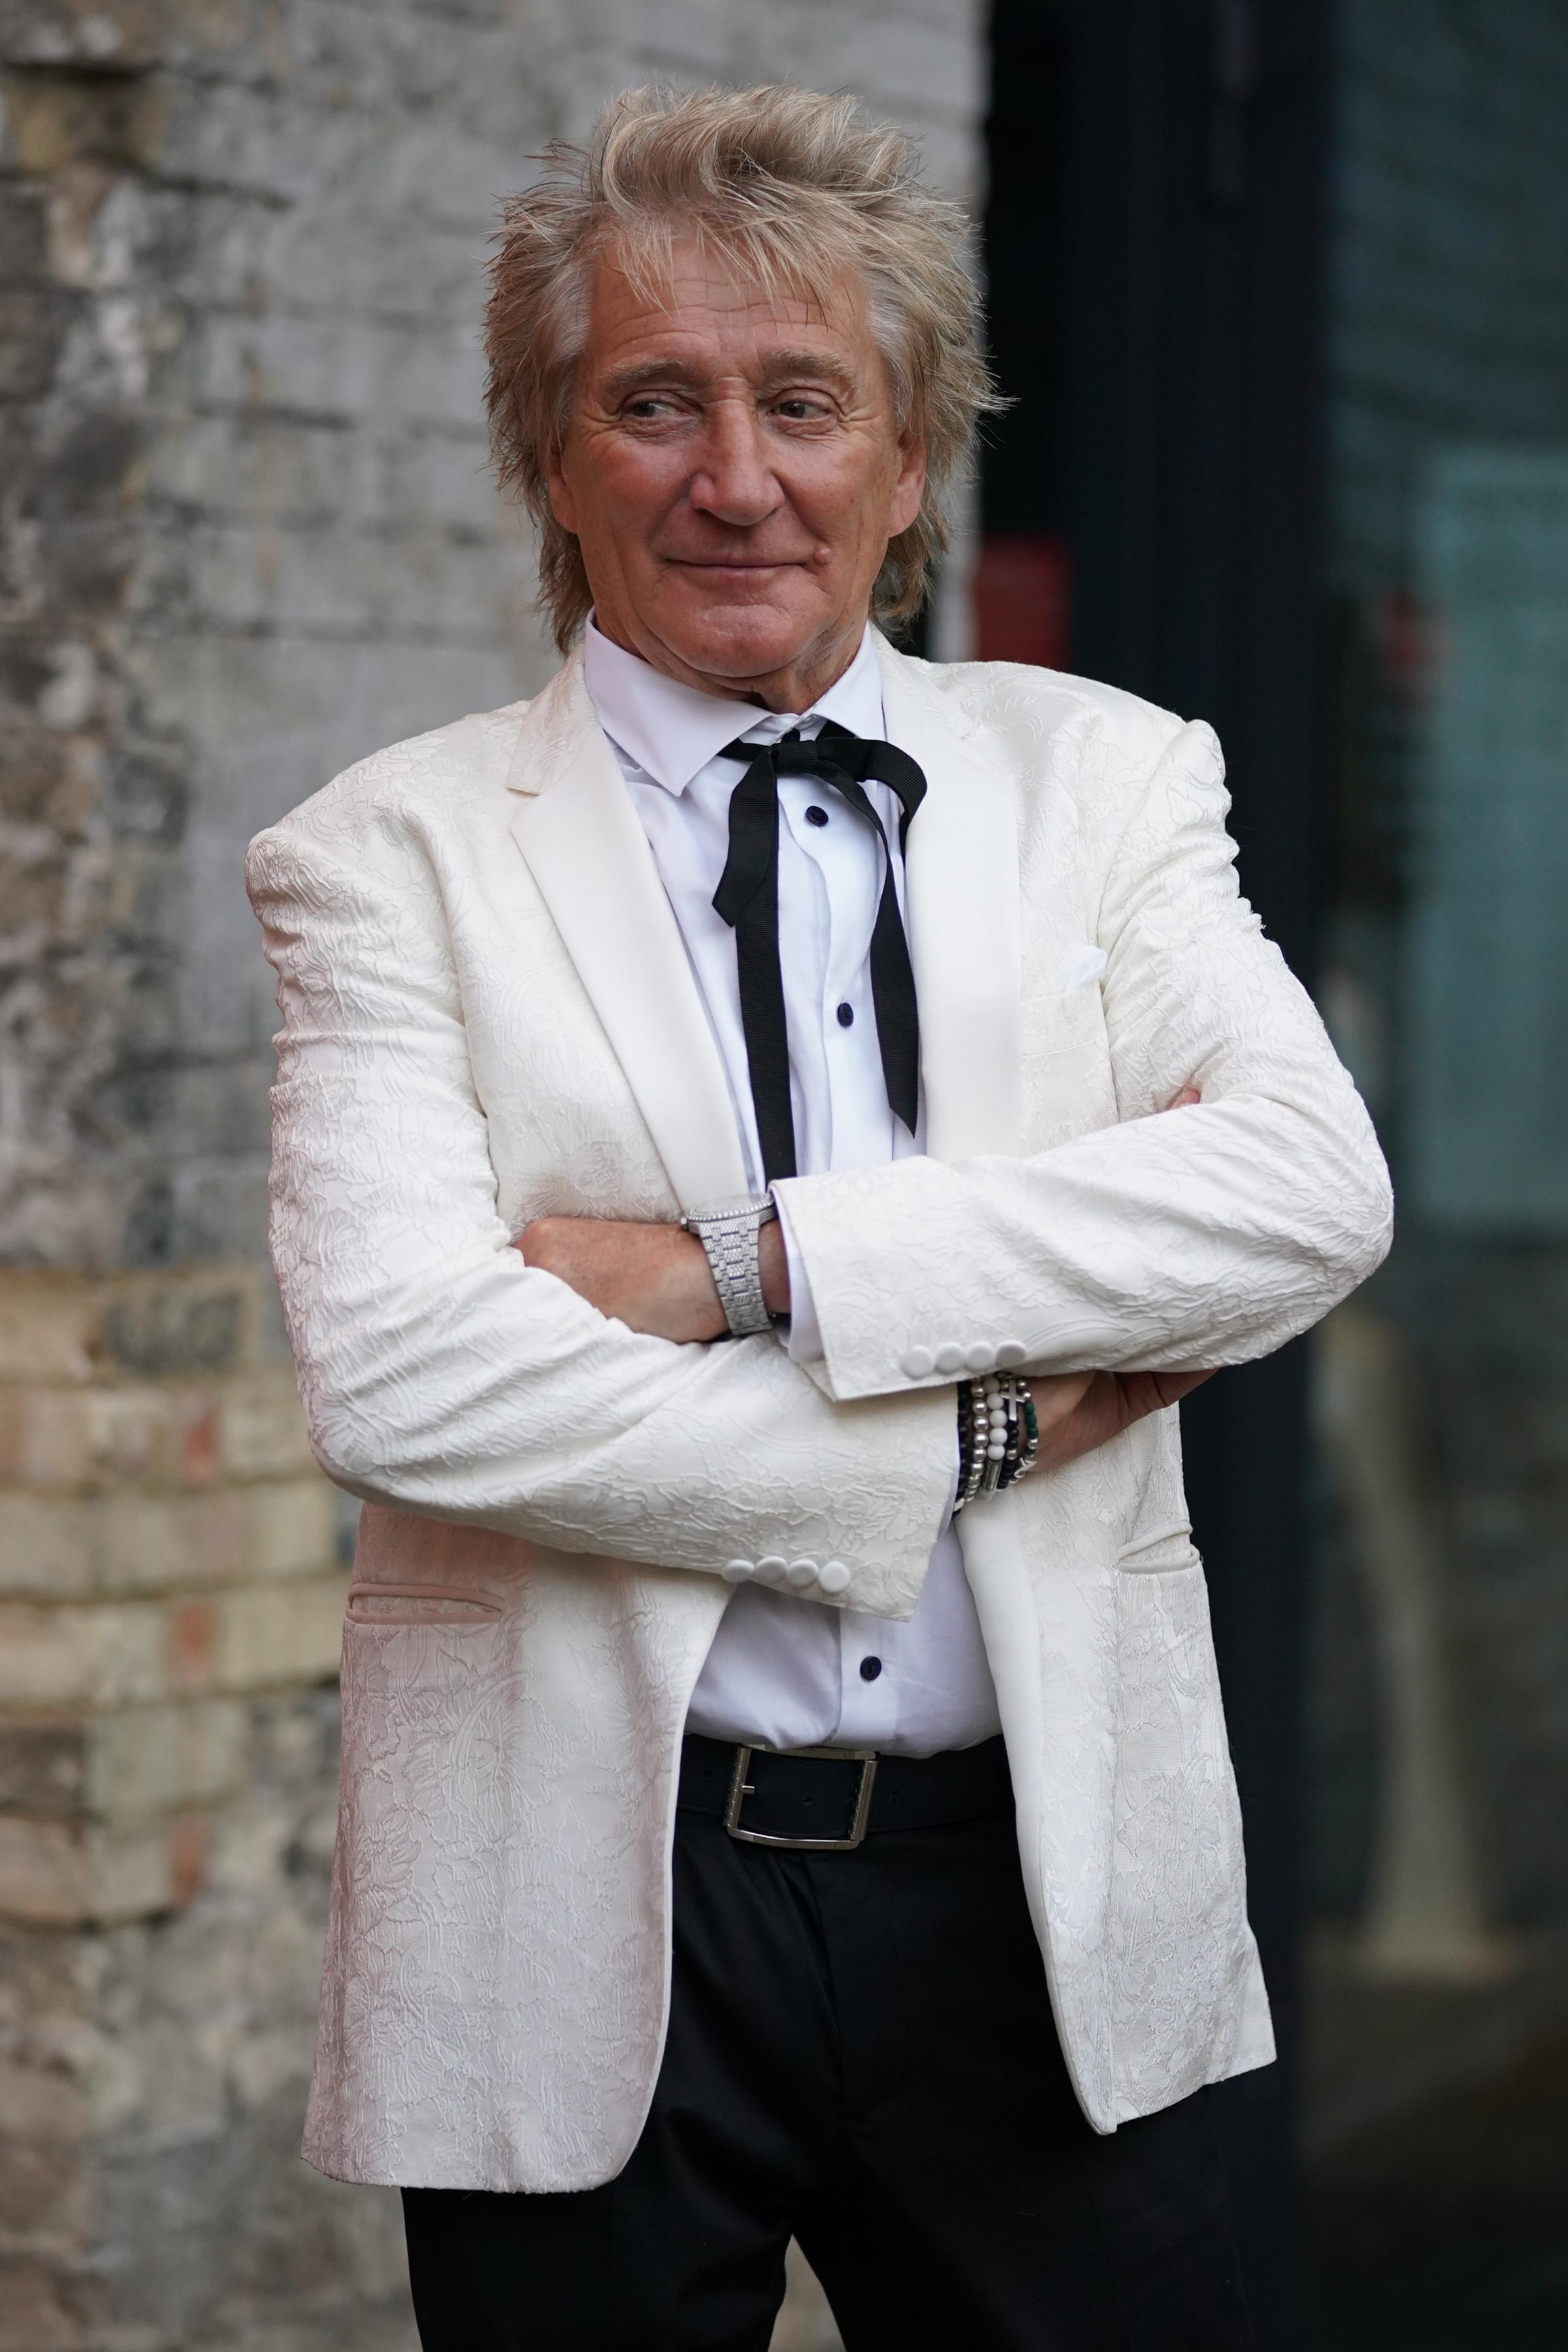 Rod Stewart mengumumkan tur The Tears of Hercules UK 2022 – cara mendapatkan tiket